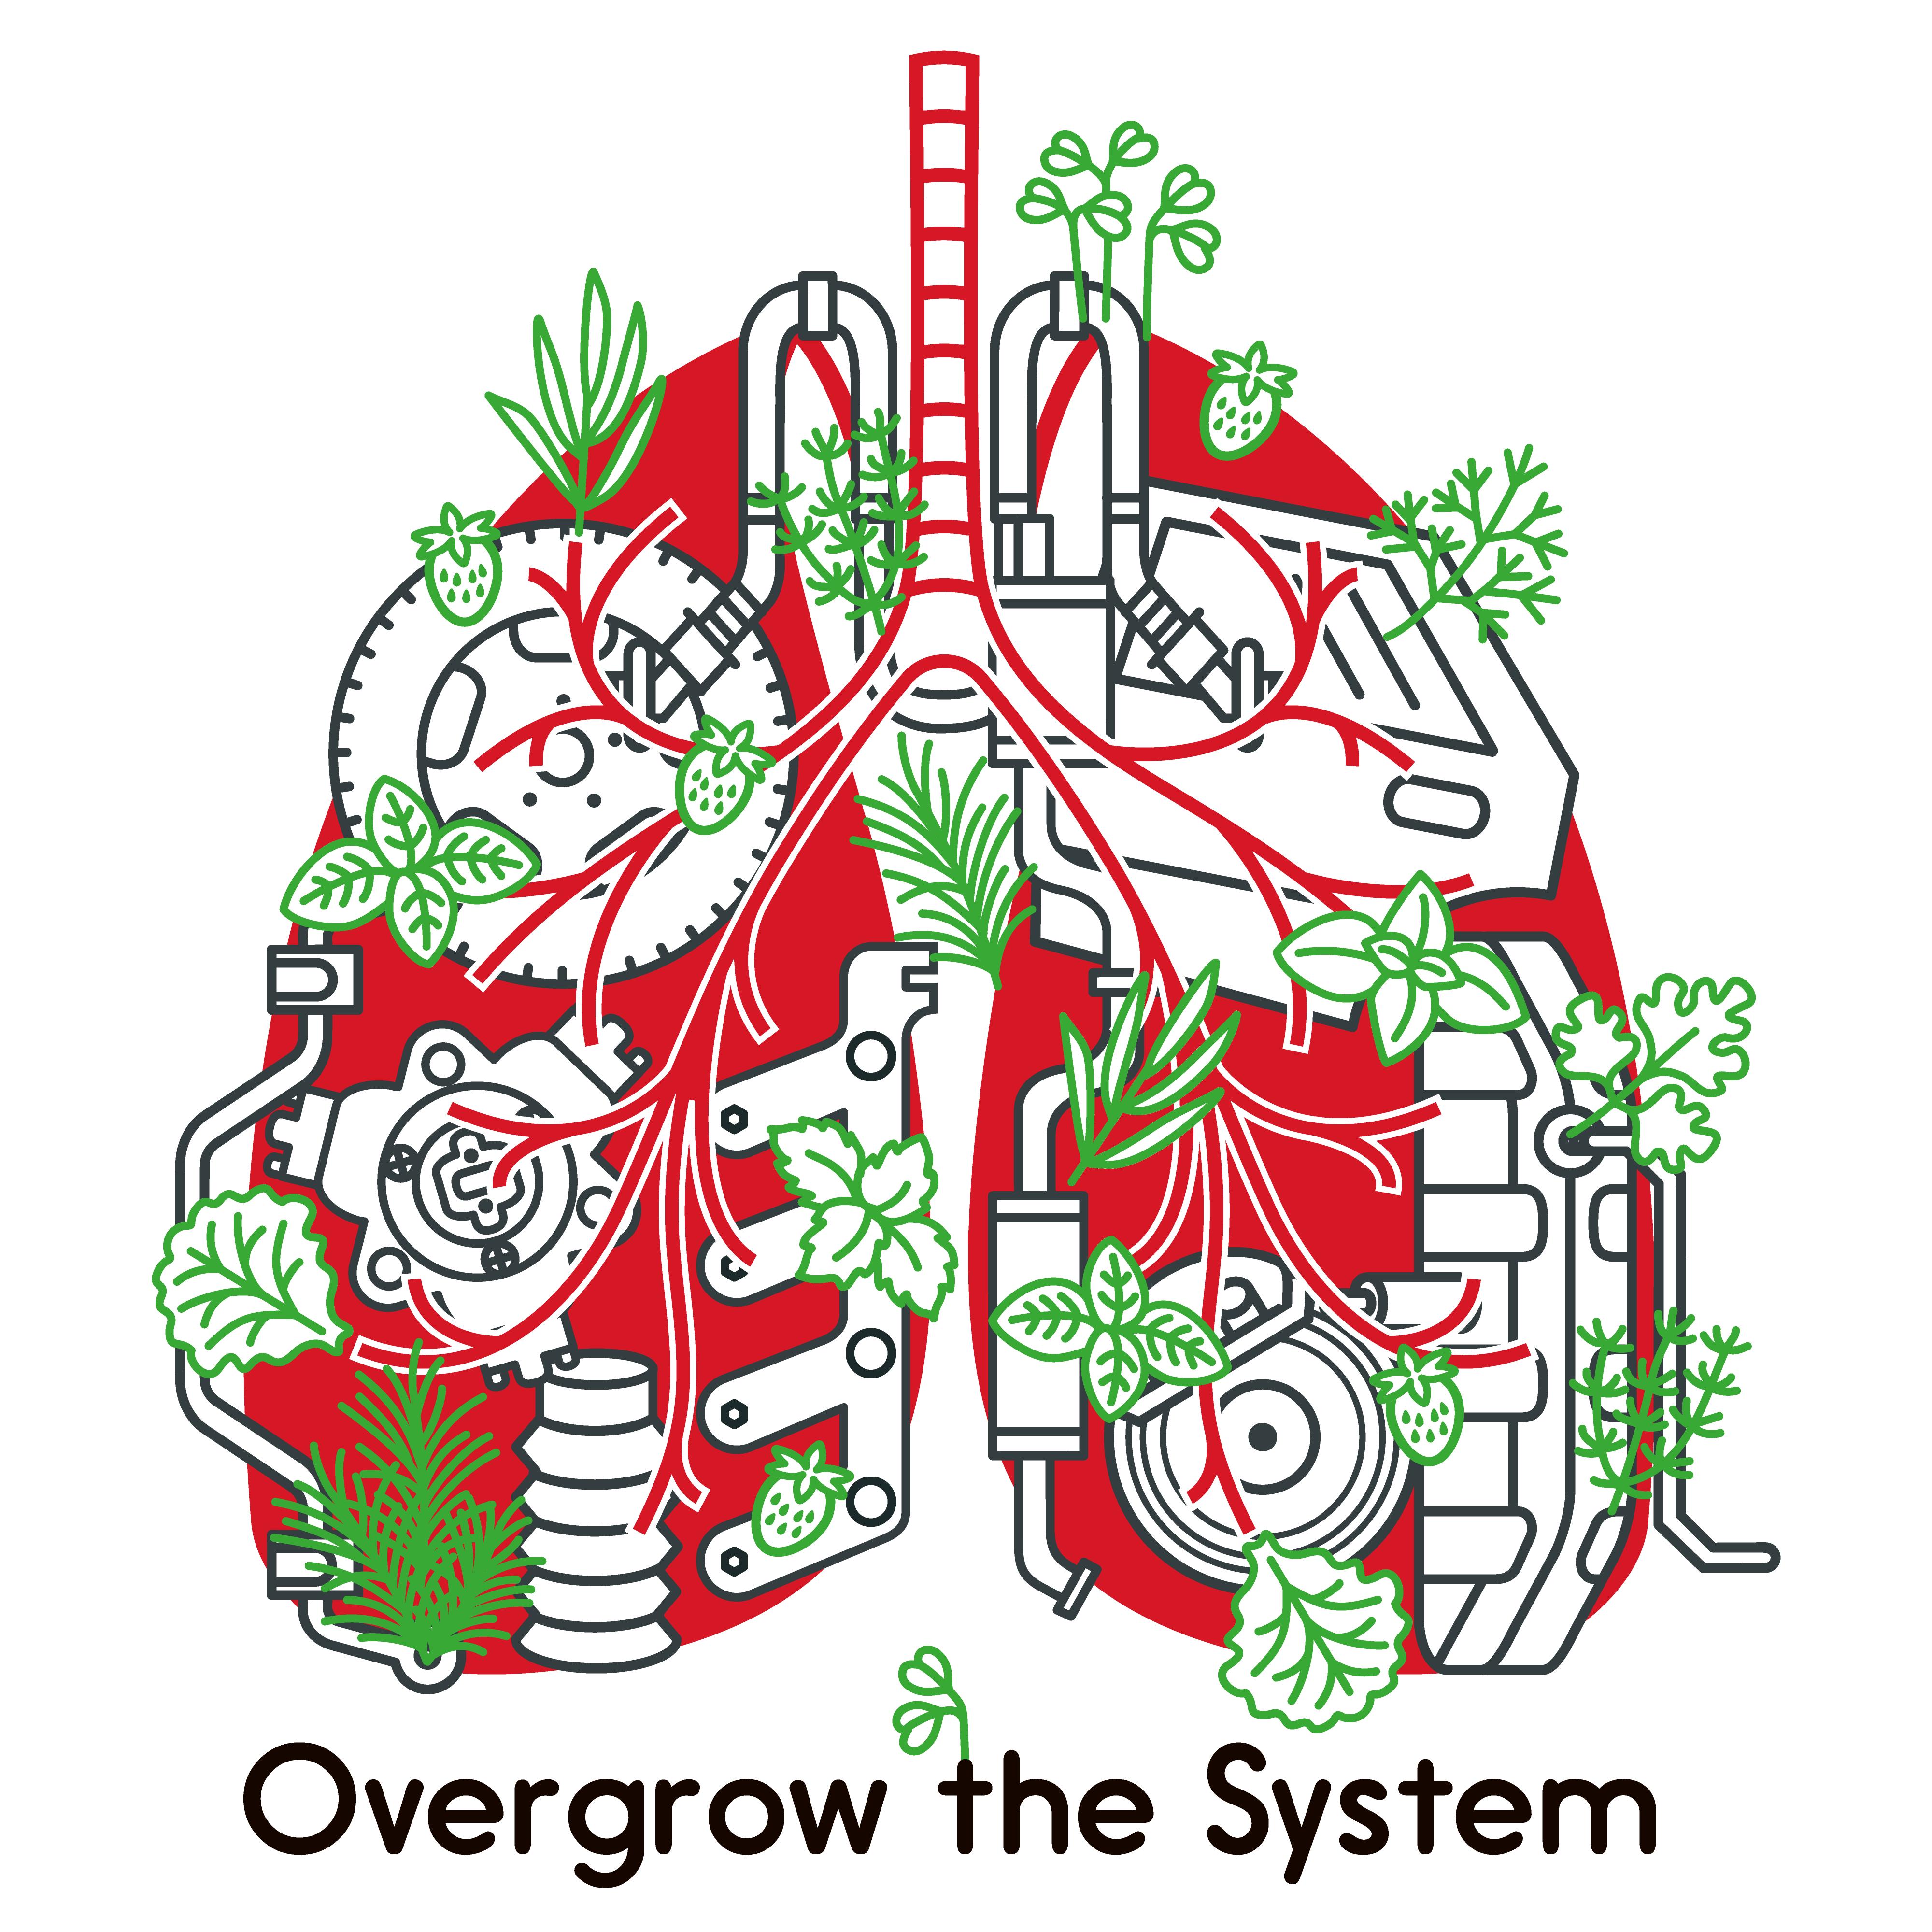 overgrowthesystem_RBG_AW_whitebg